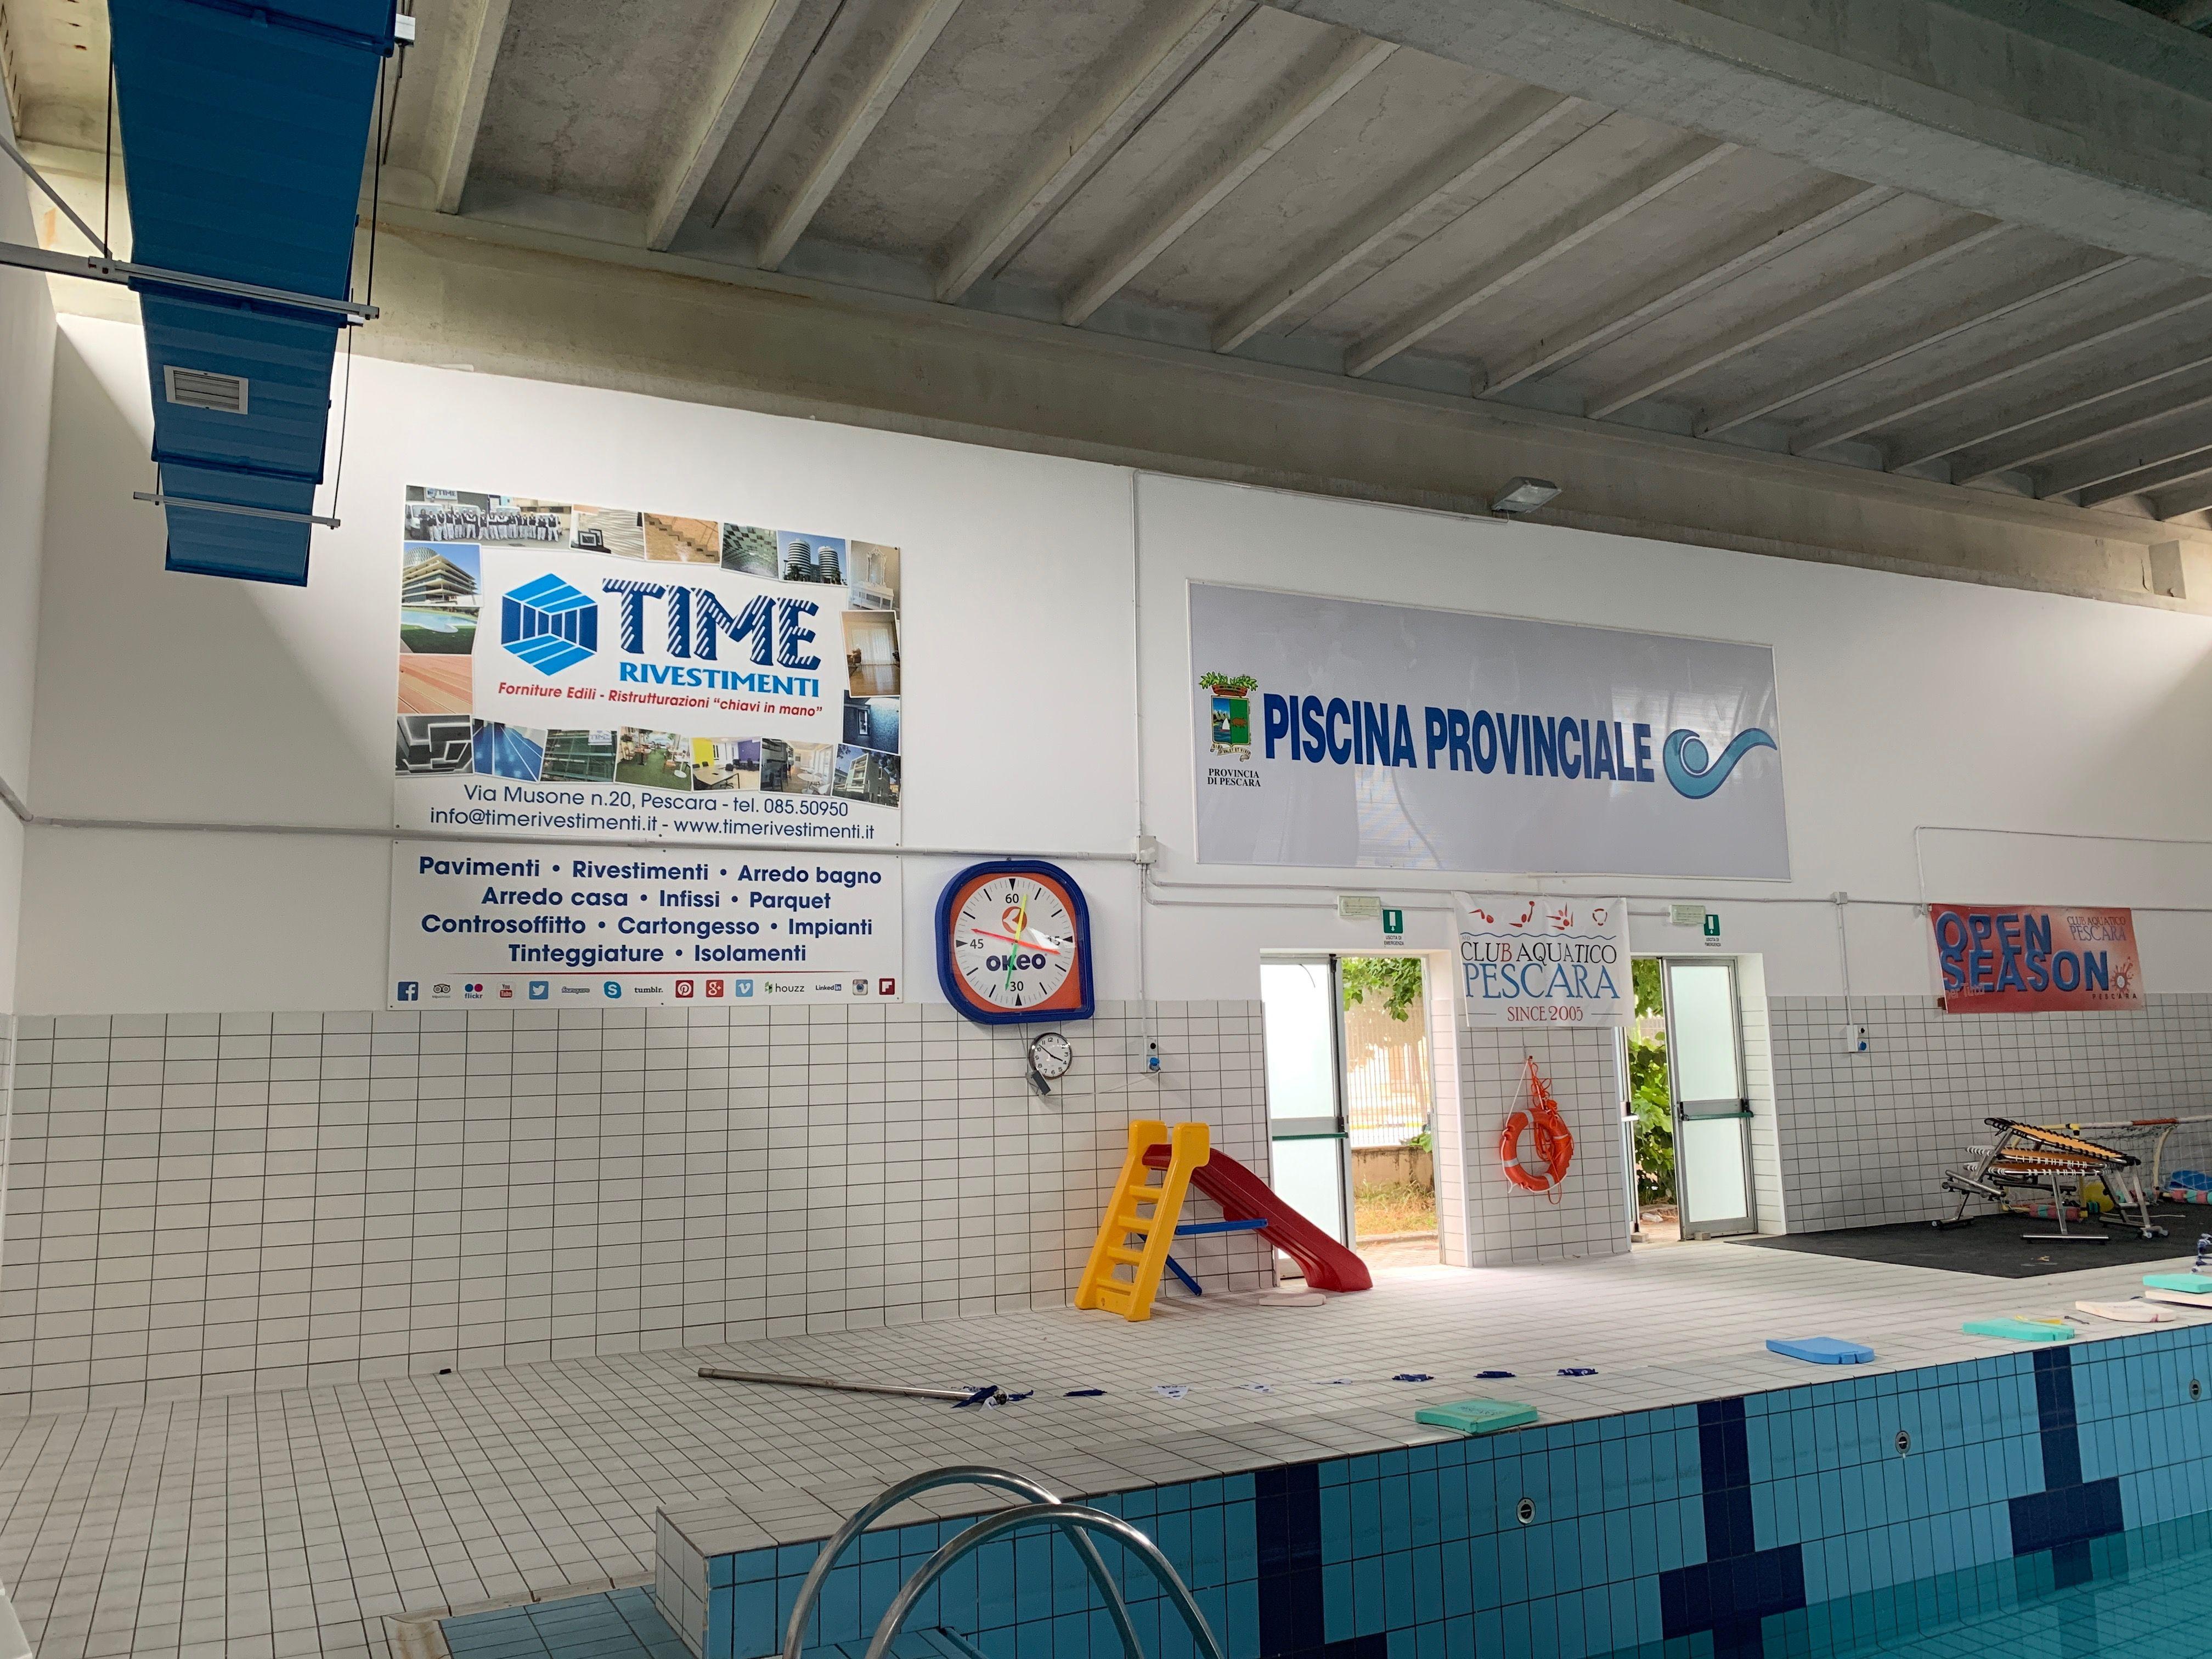 Piscina Provinciale Pescara, work in progress! Time ...